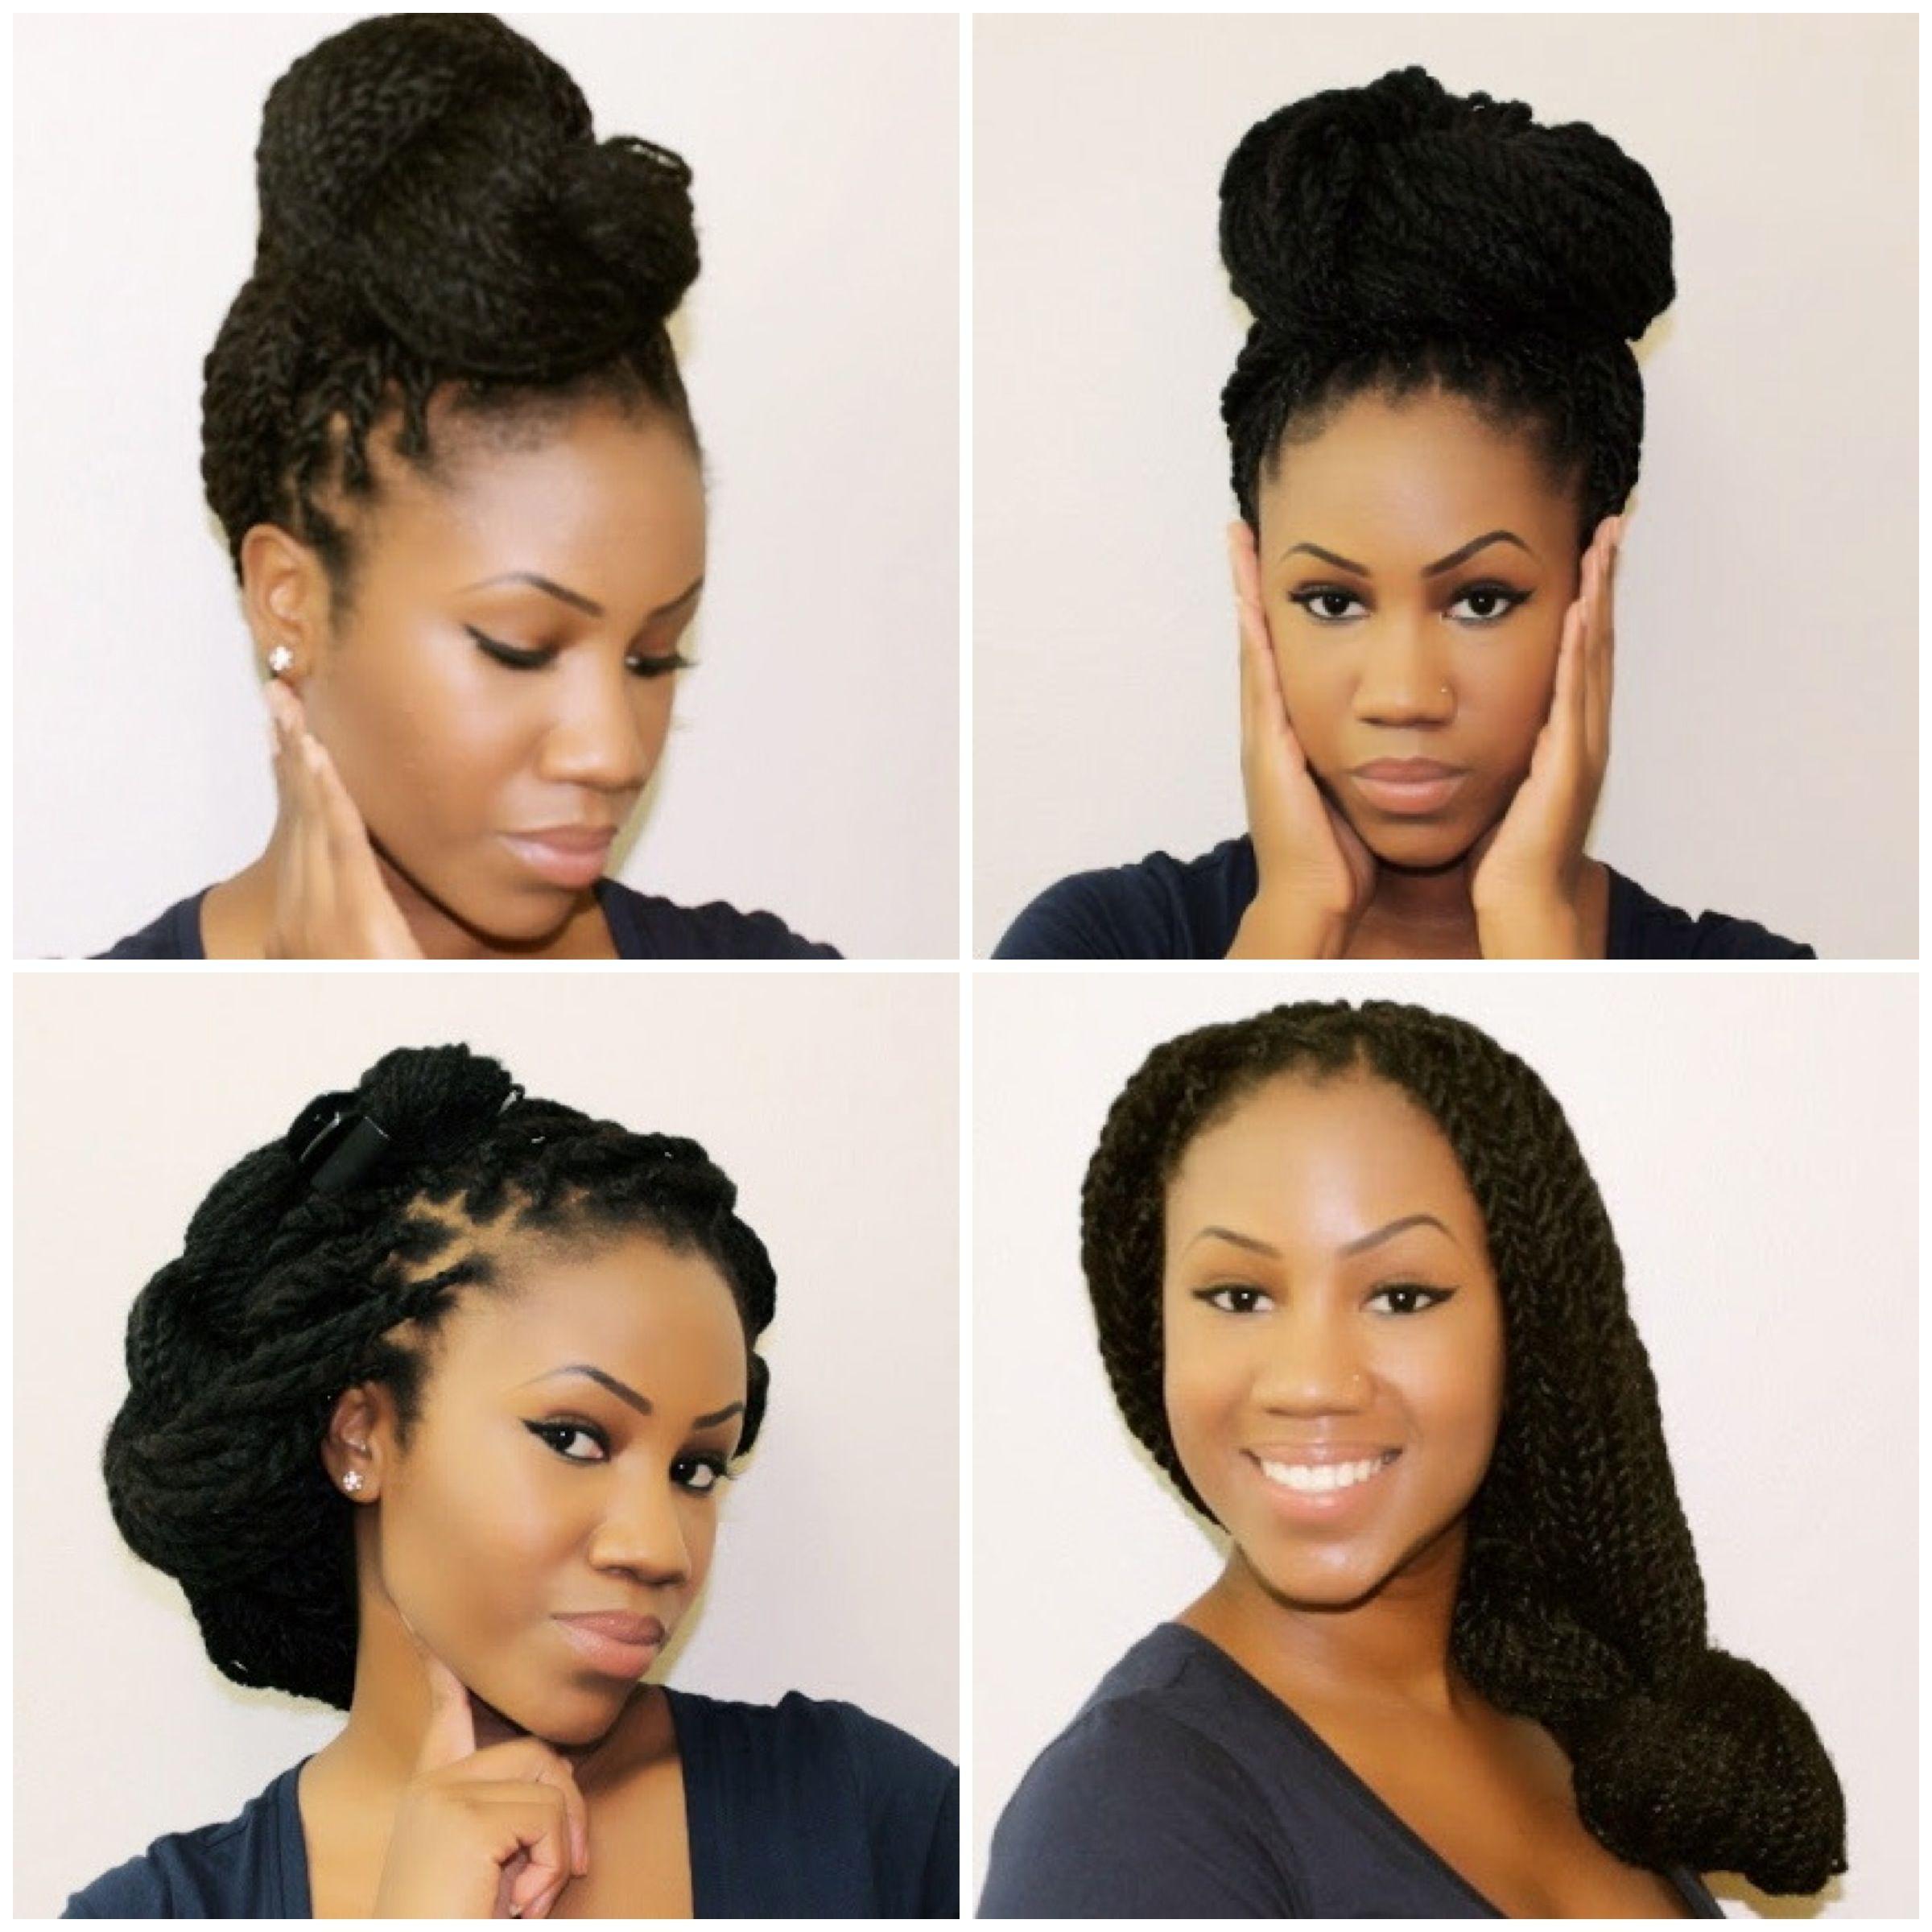 Pleasing Twists Senegalese Twists And Love On Pinterest Short Hairstyles Gunalazisus